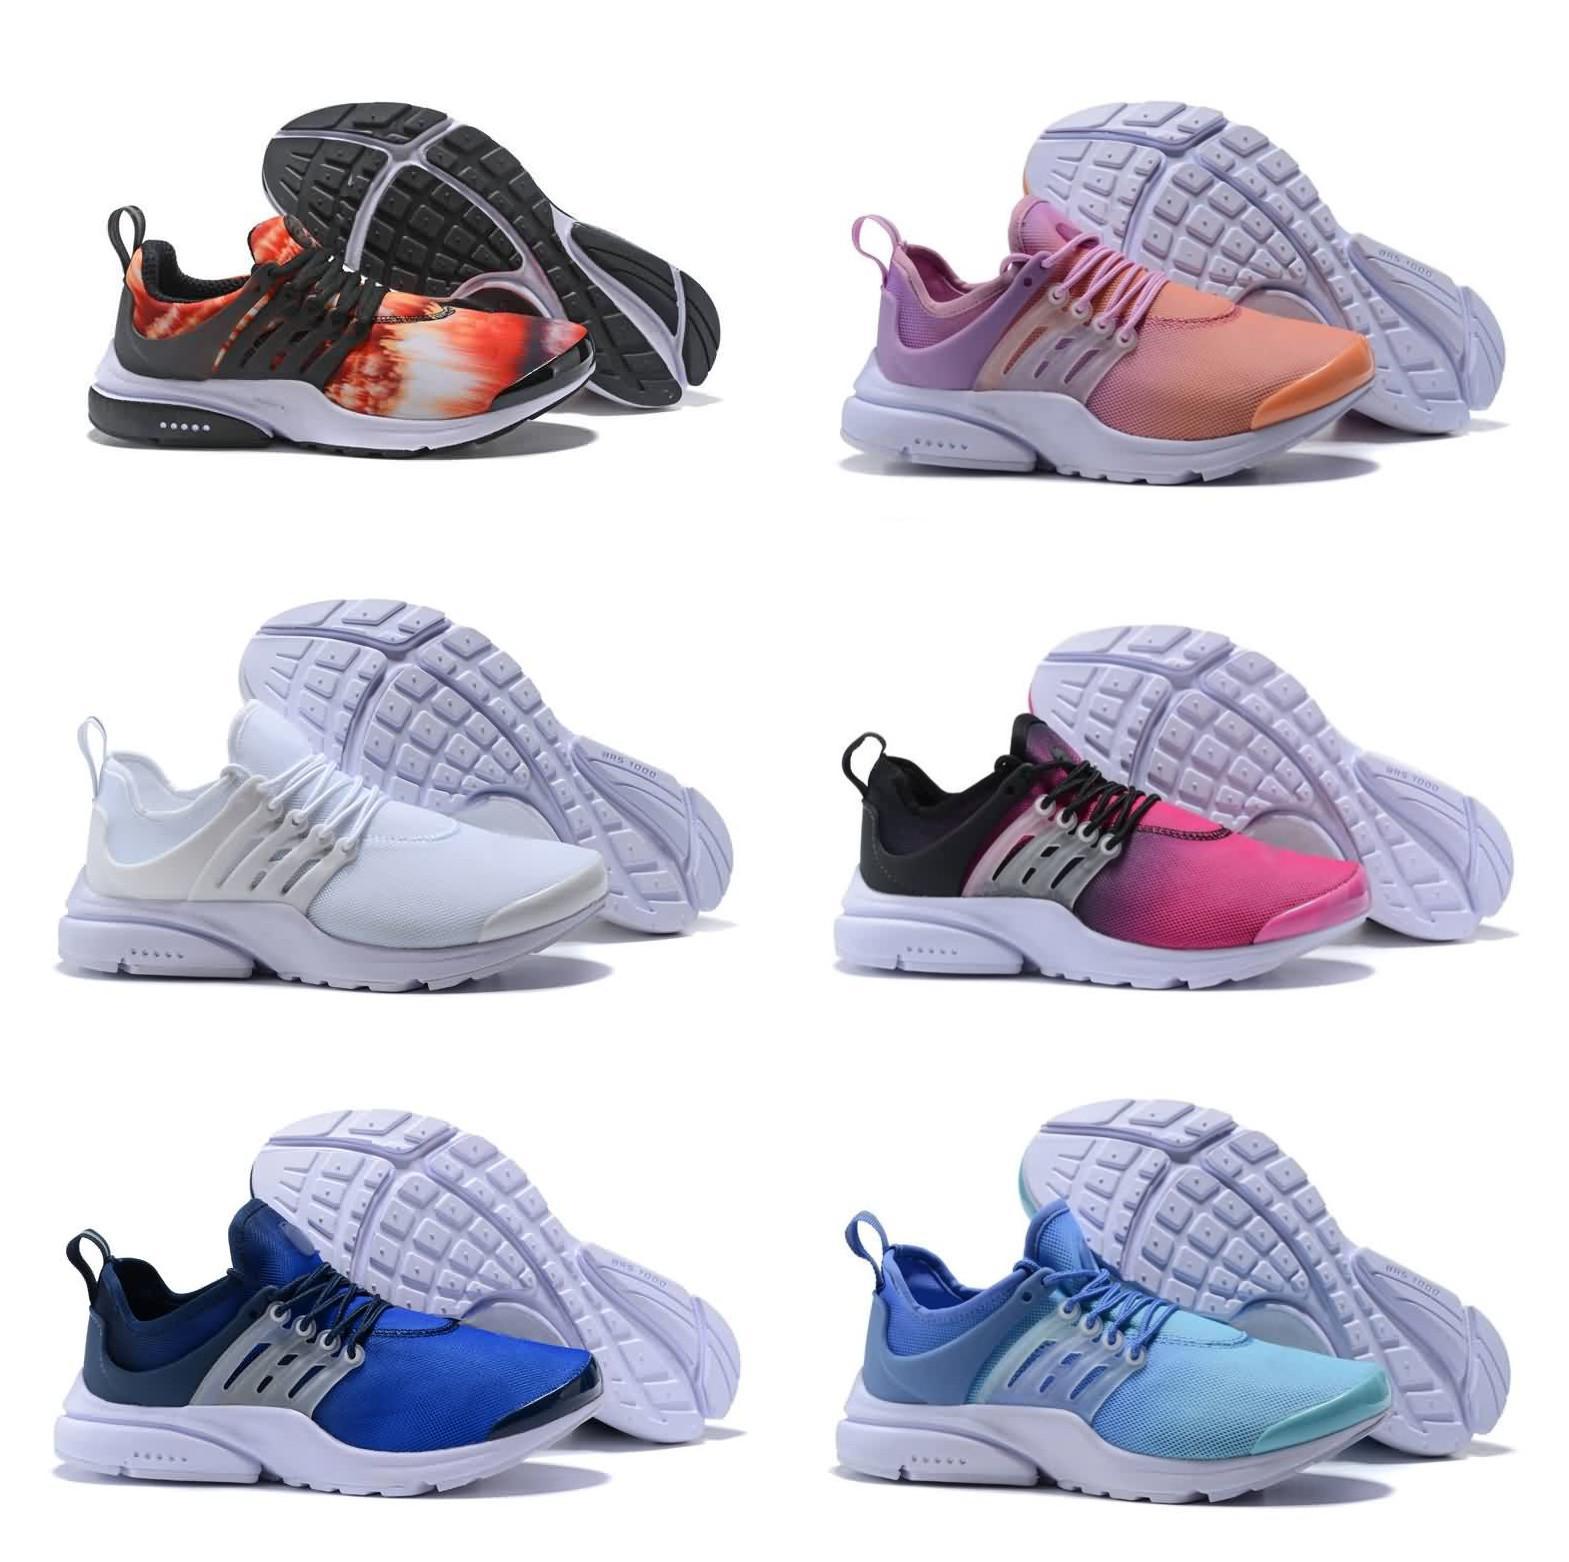 c8e01956d7e Womens Presto 802 803 New Designer Shoes Chaussures Prestos Running ...